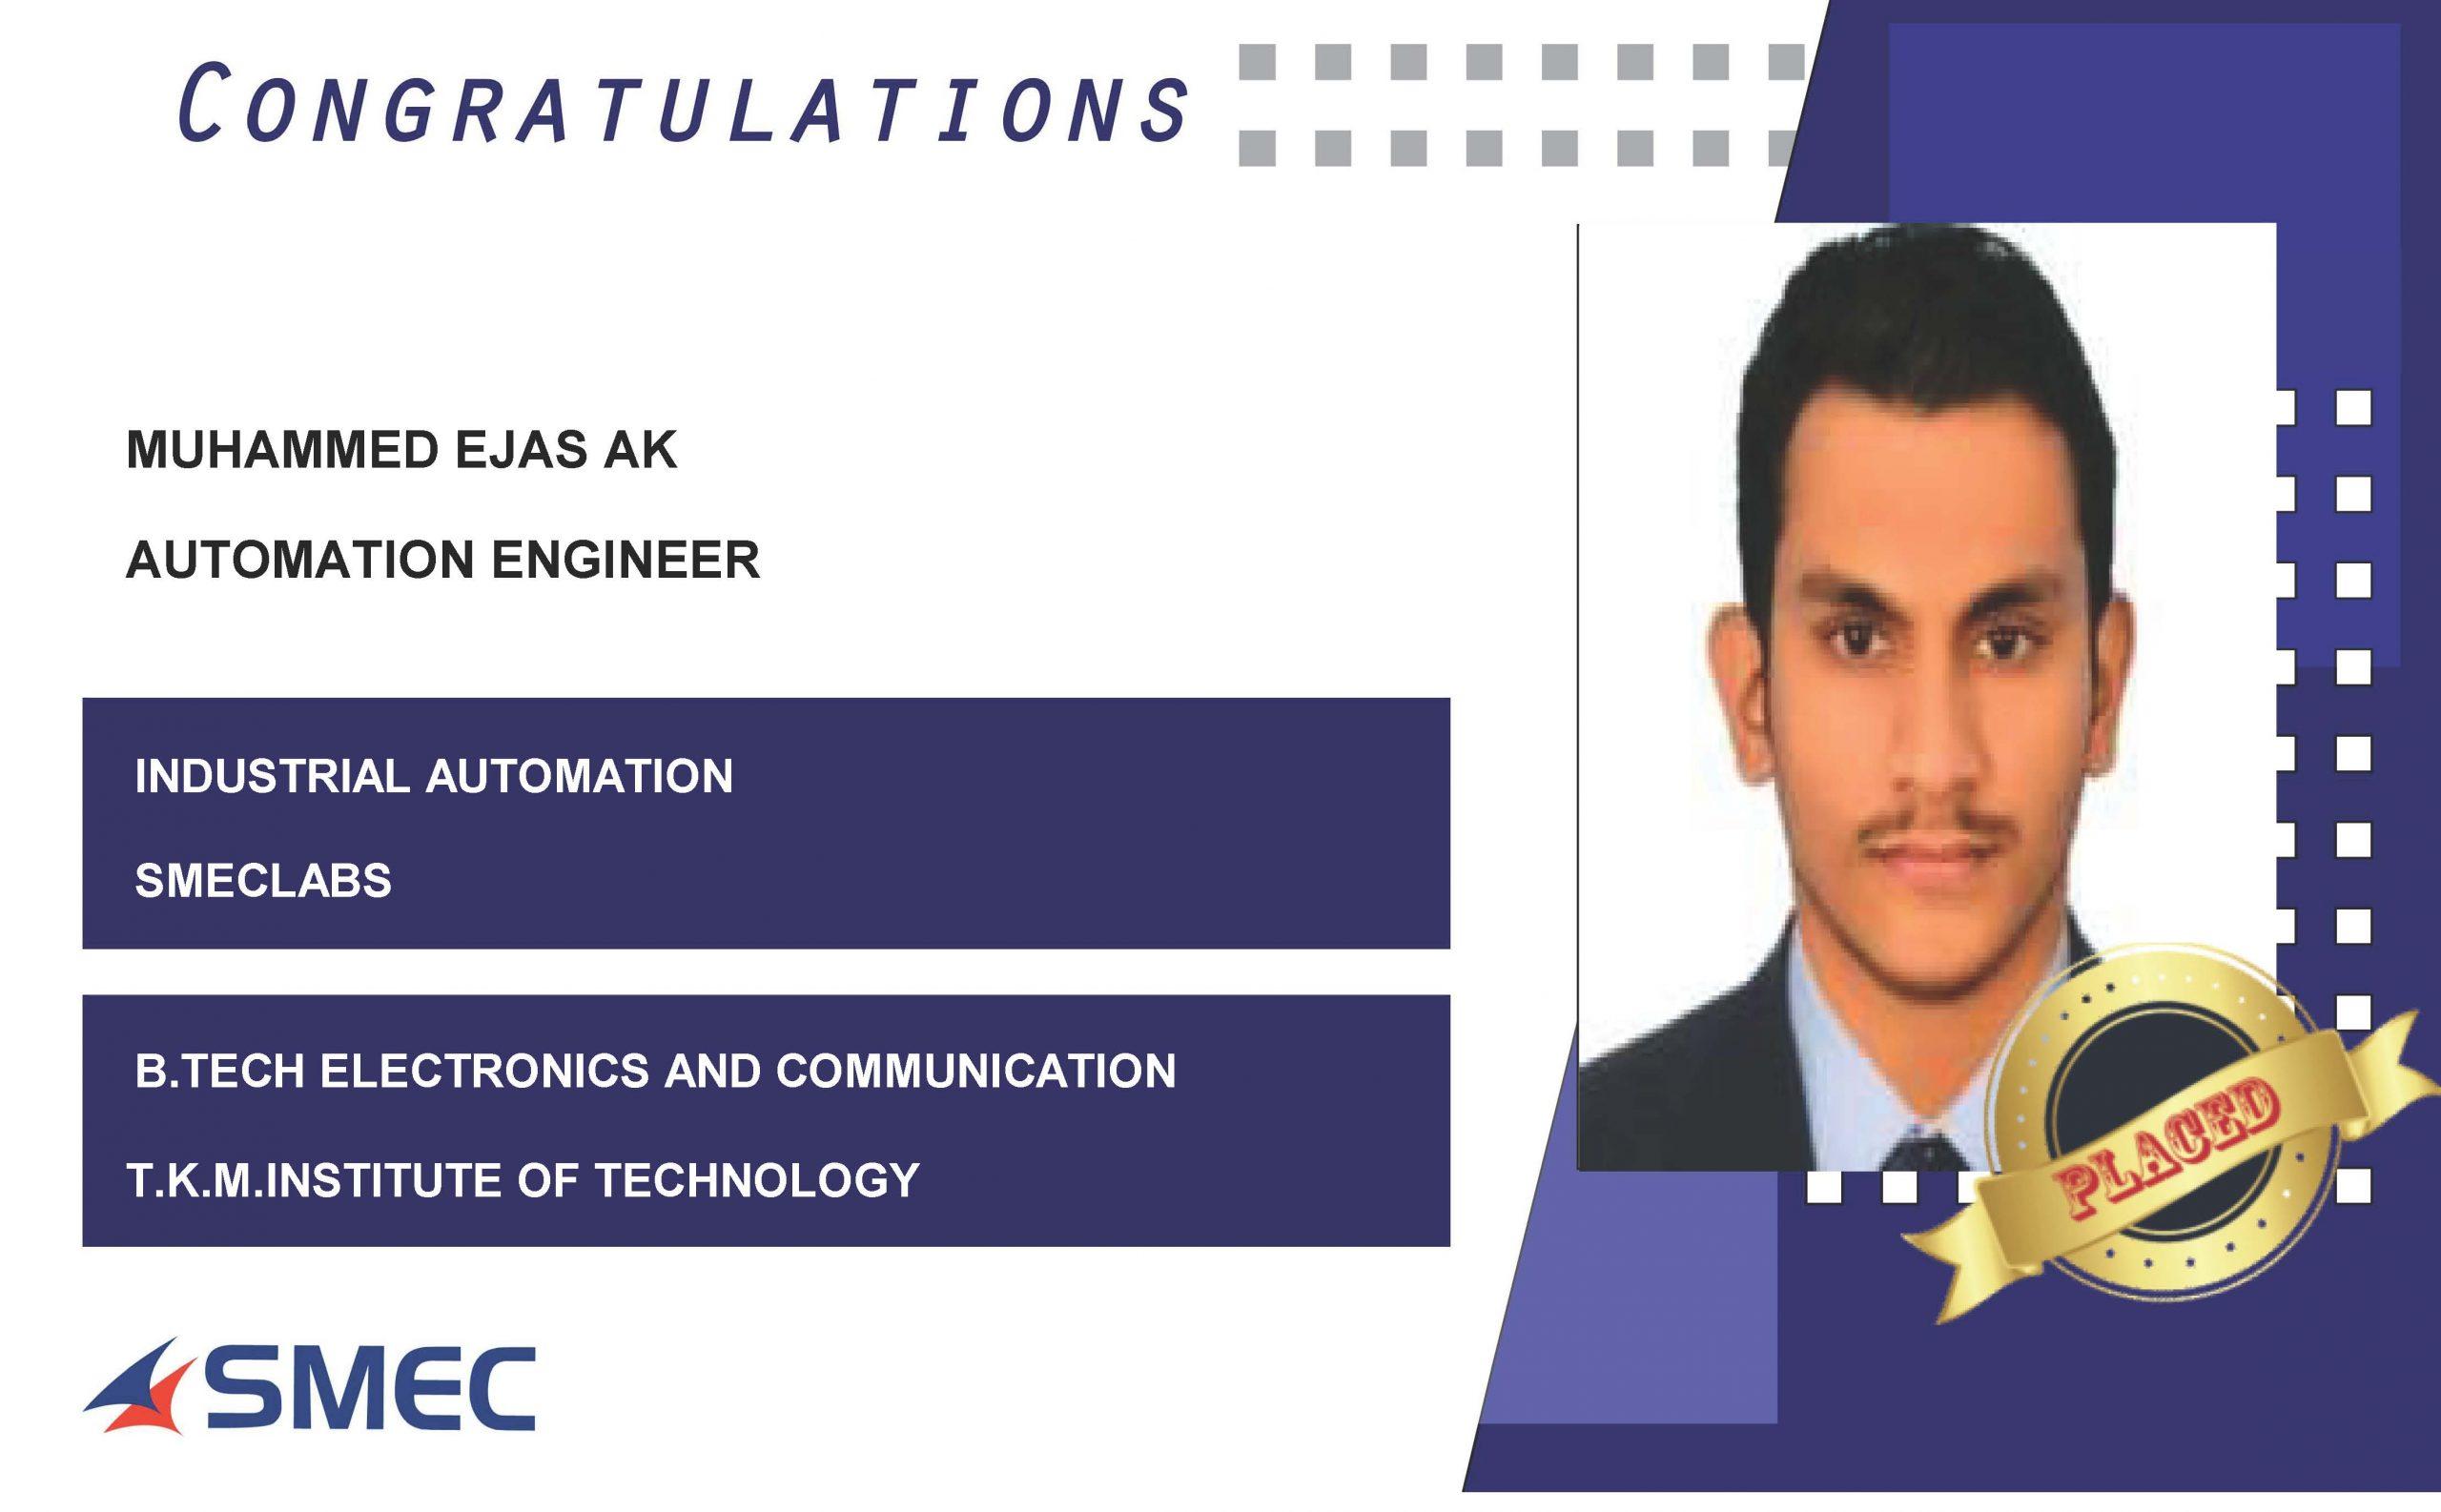 AUTOMATION ENGINEER JOBS-muhammed ejas ak